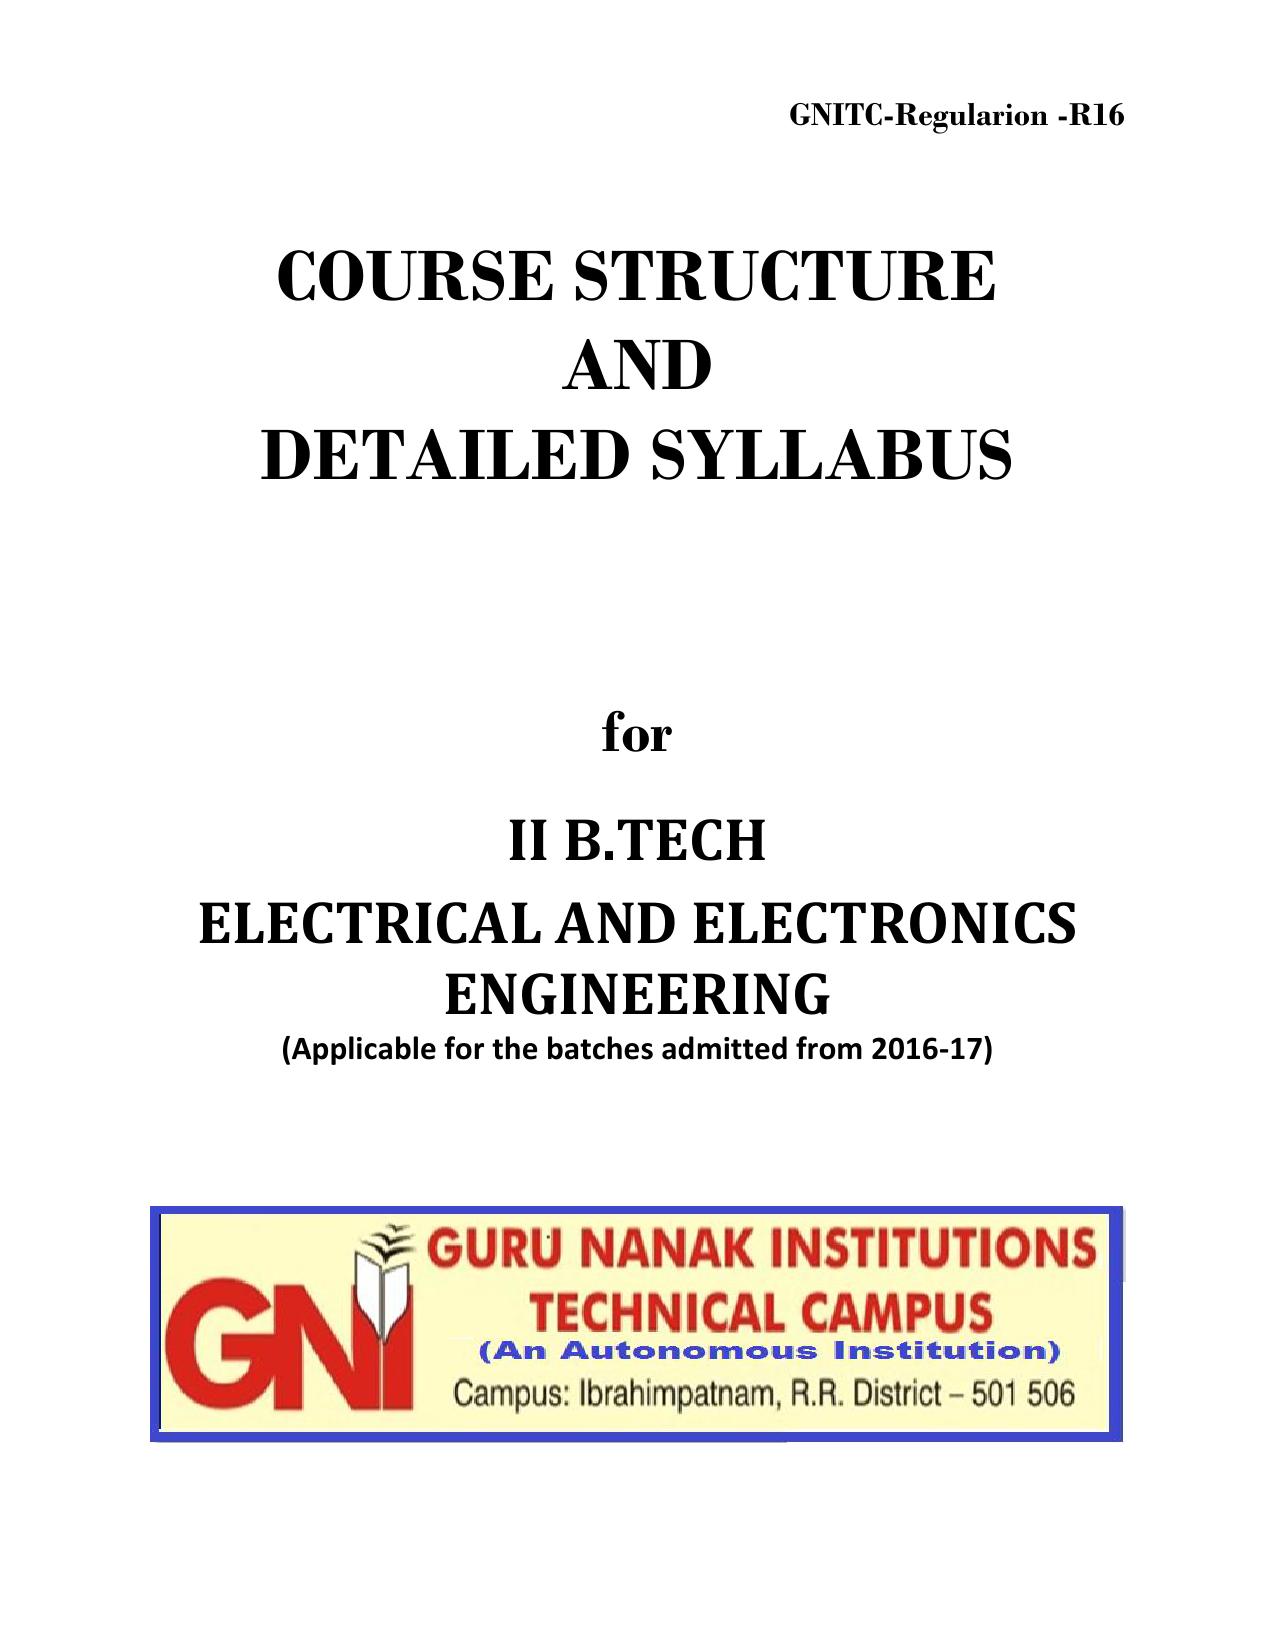 Eee Department Syllabus Guru Nanak Institutions Dc Thevenin Equivalent Example 1 Youtube